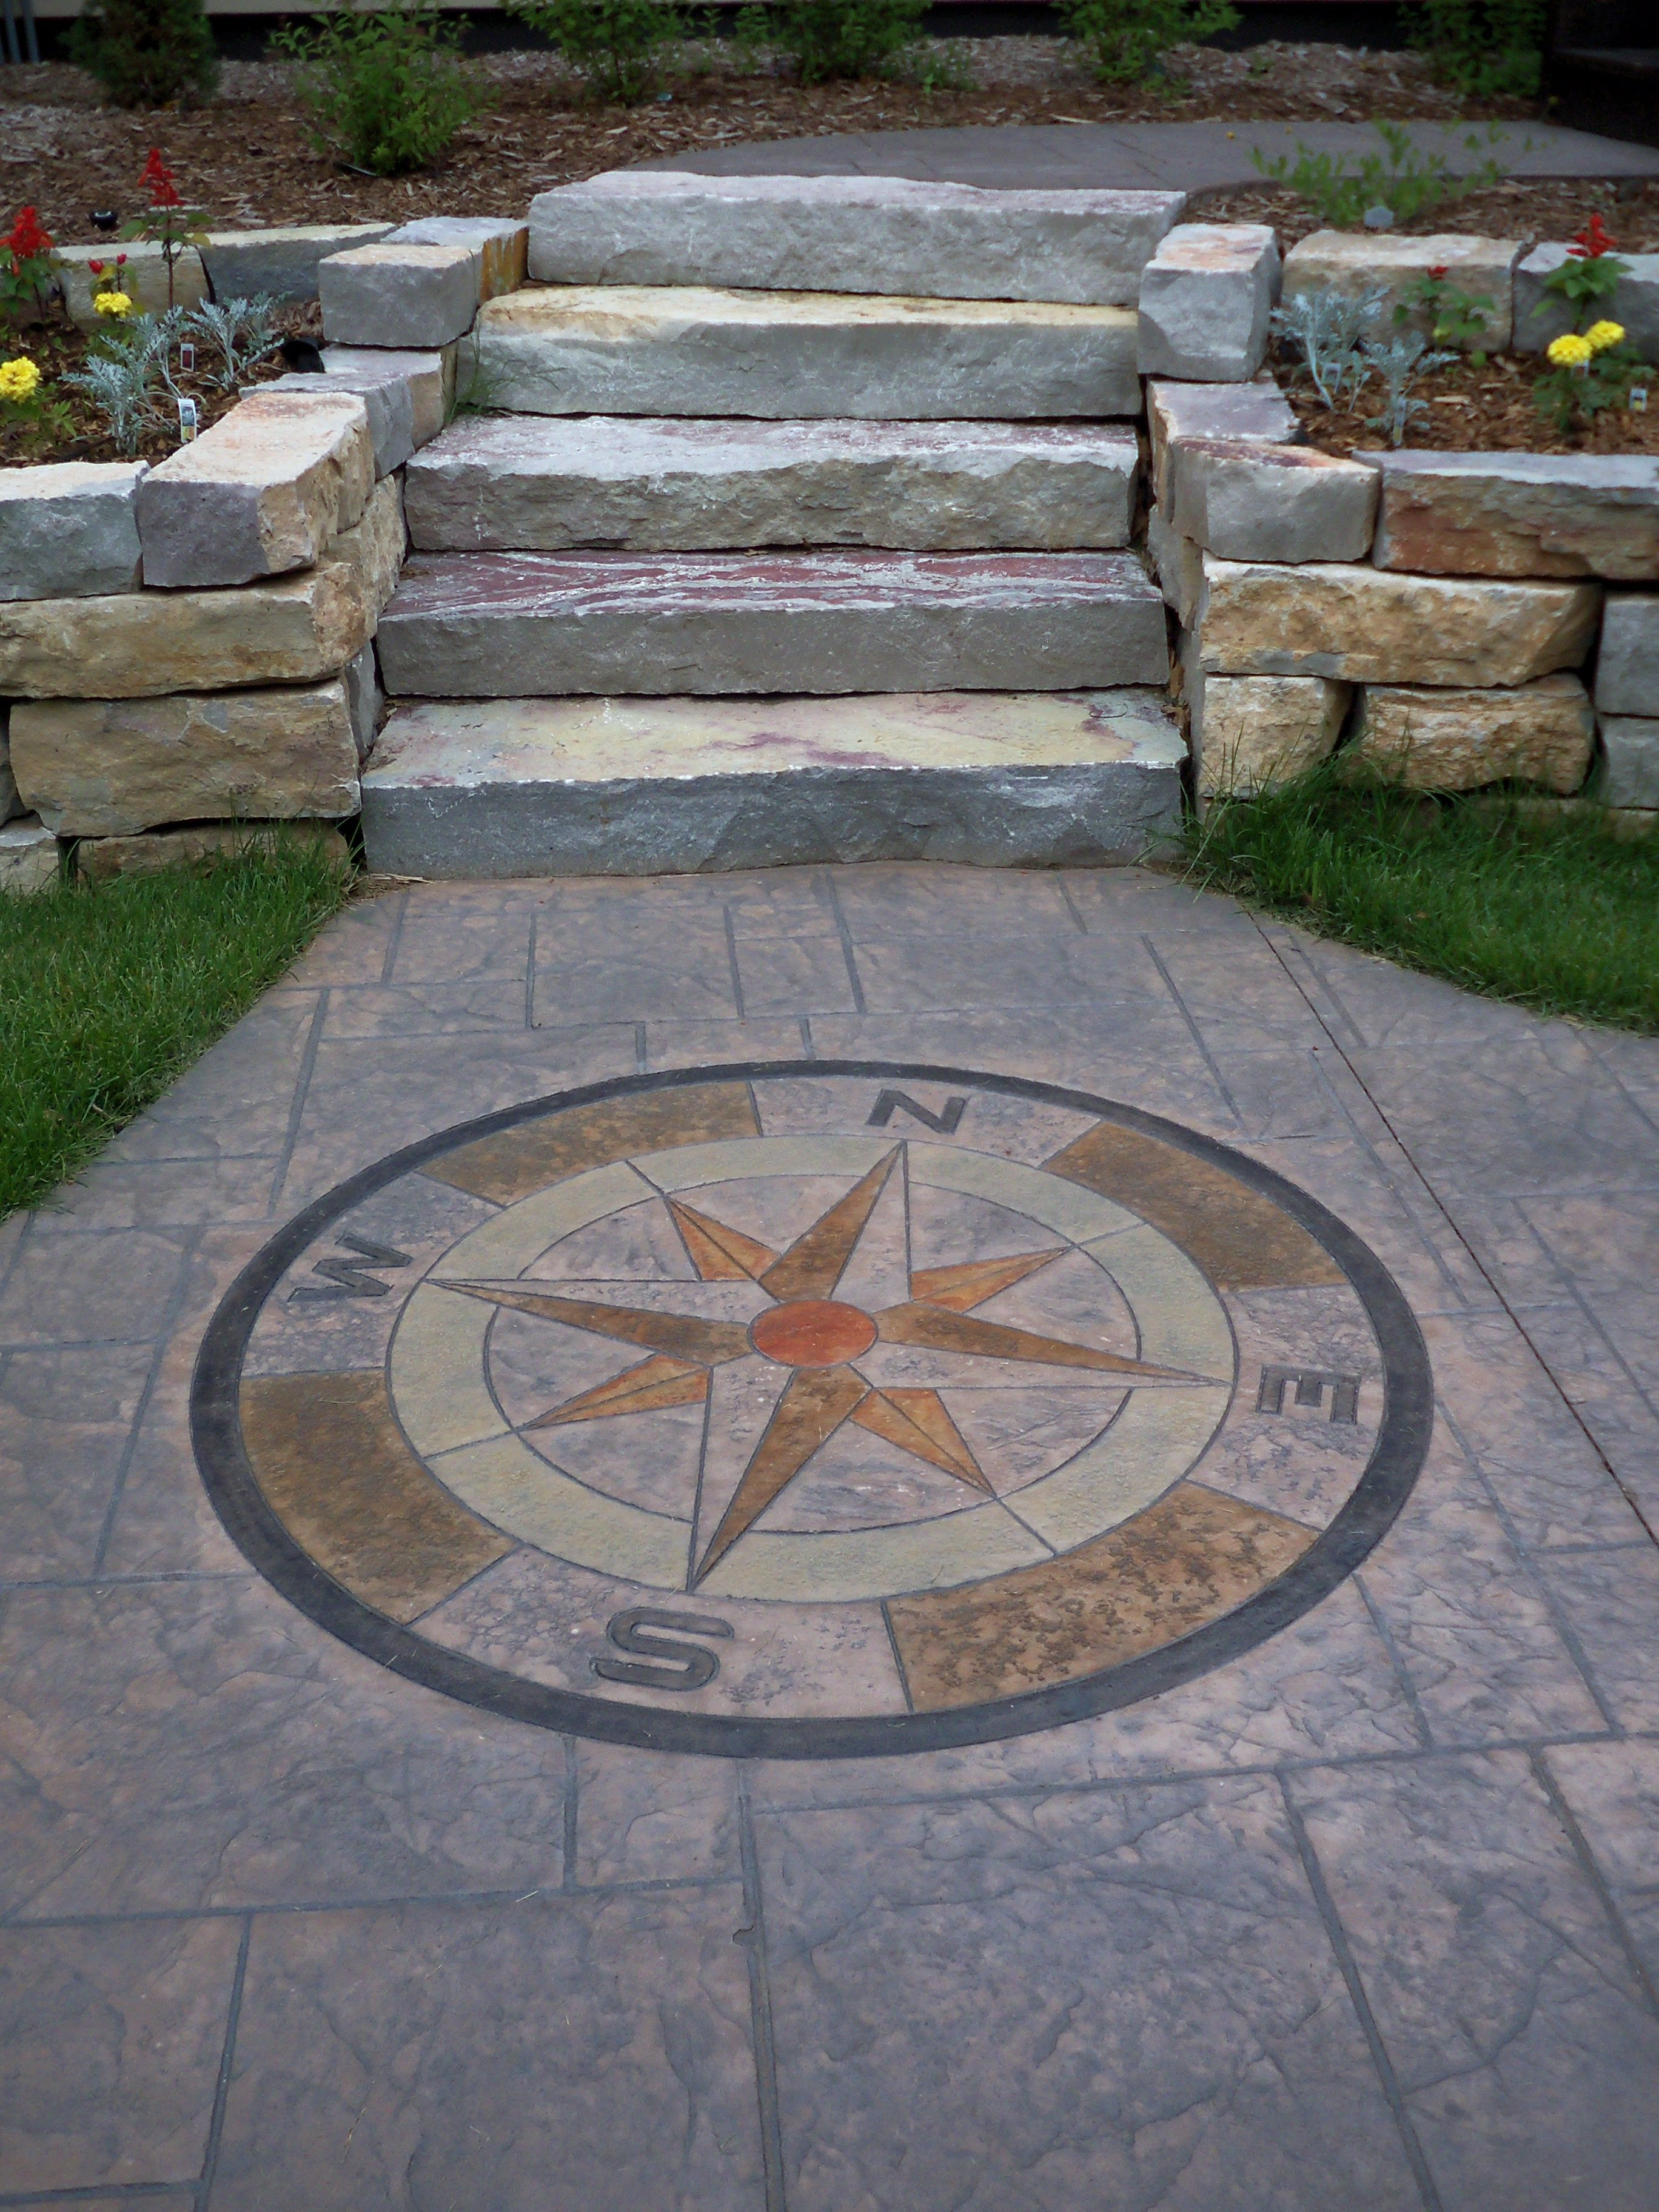 Compass Design: A Natural And Practical Garden Decoration